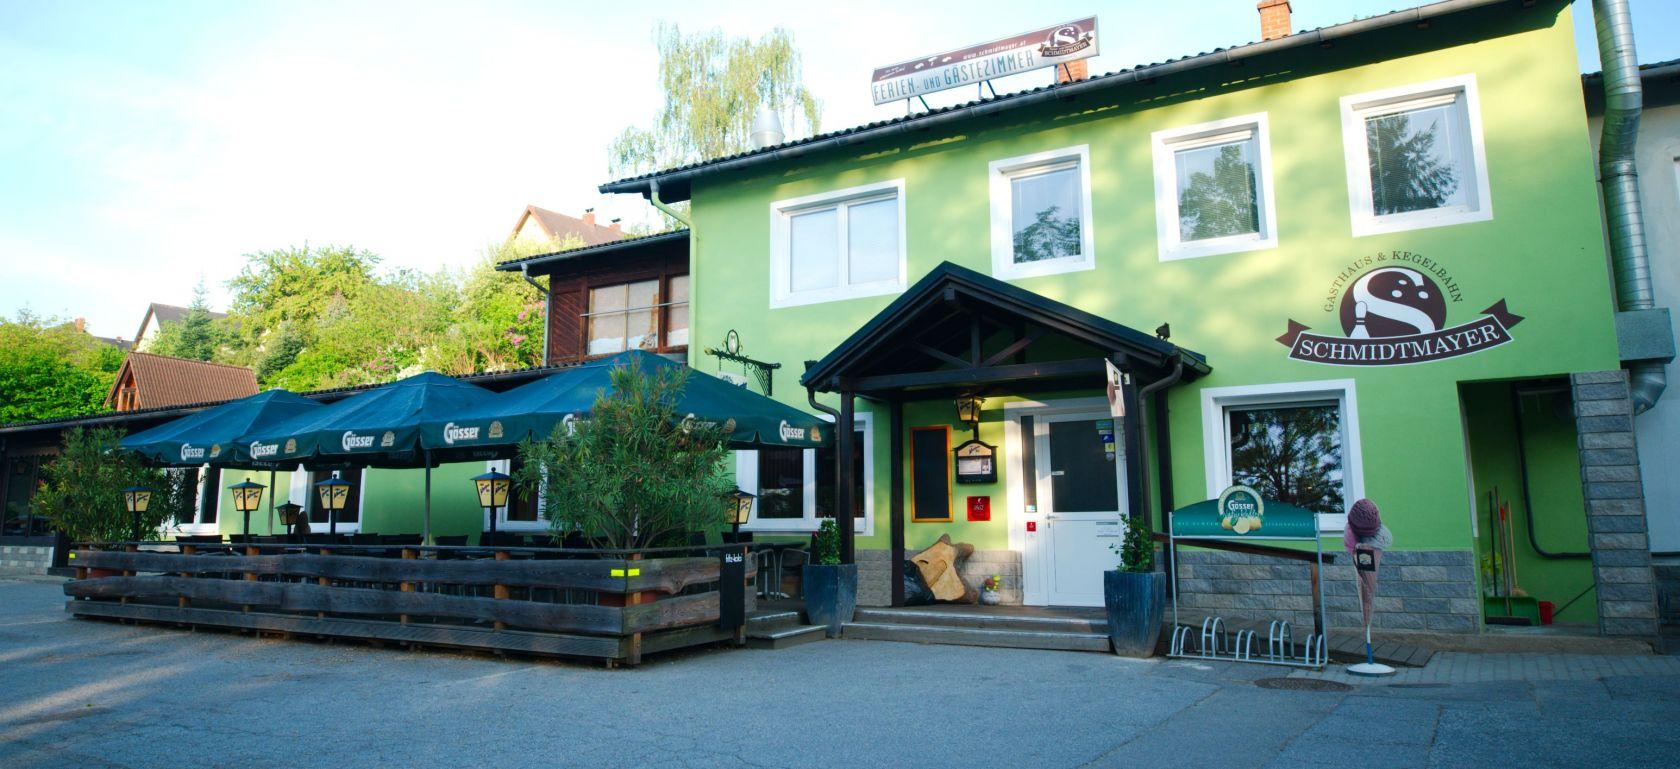 Thayarunde-Gasthaus & Kegelbahn  Gästezimmer Schmidtmayer